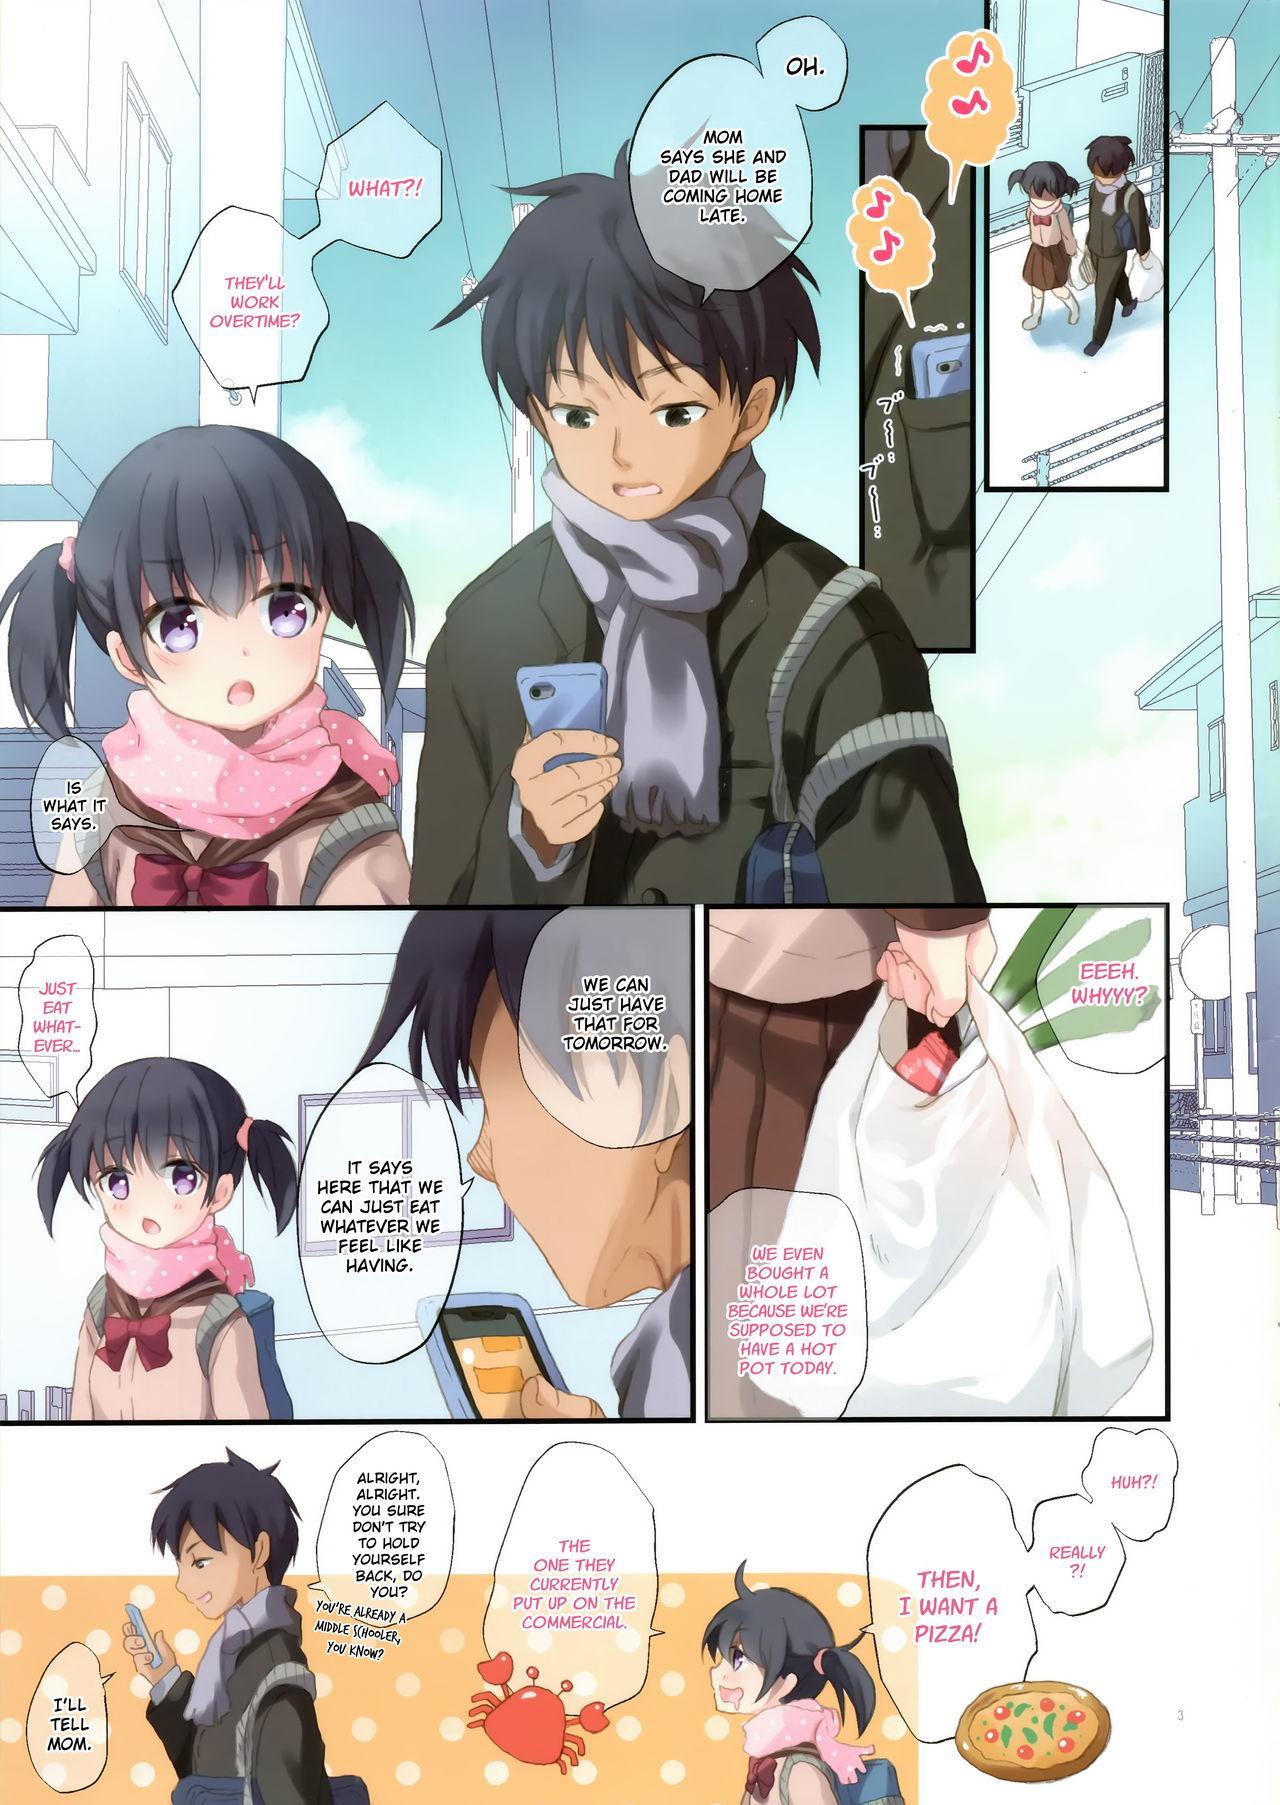 Imouto to Hajimemashita | My Little Sister and I Had Our First Time 2